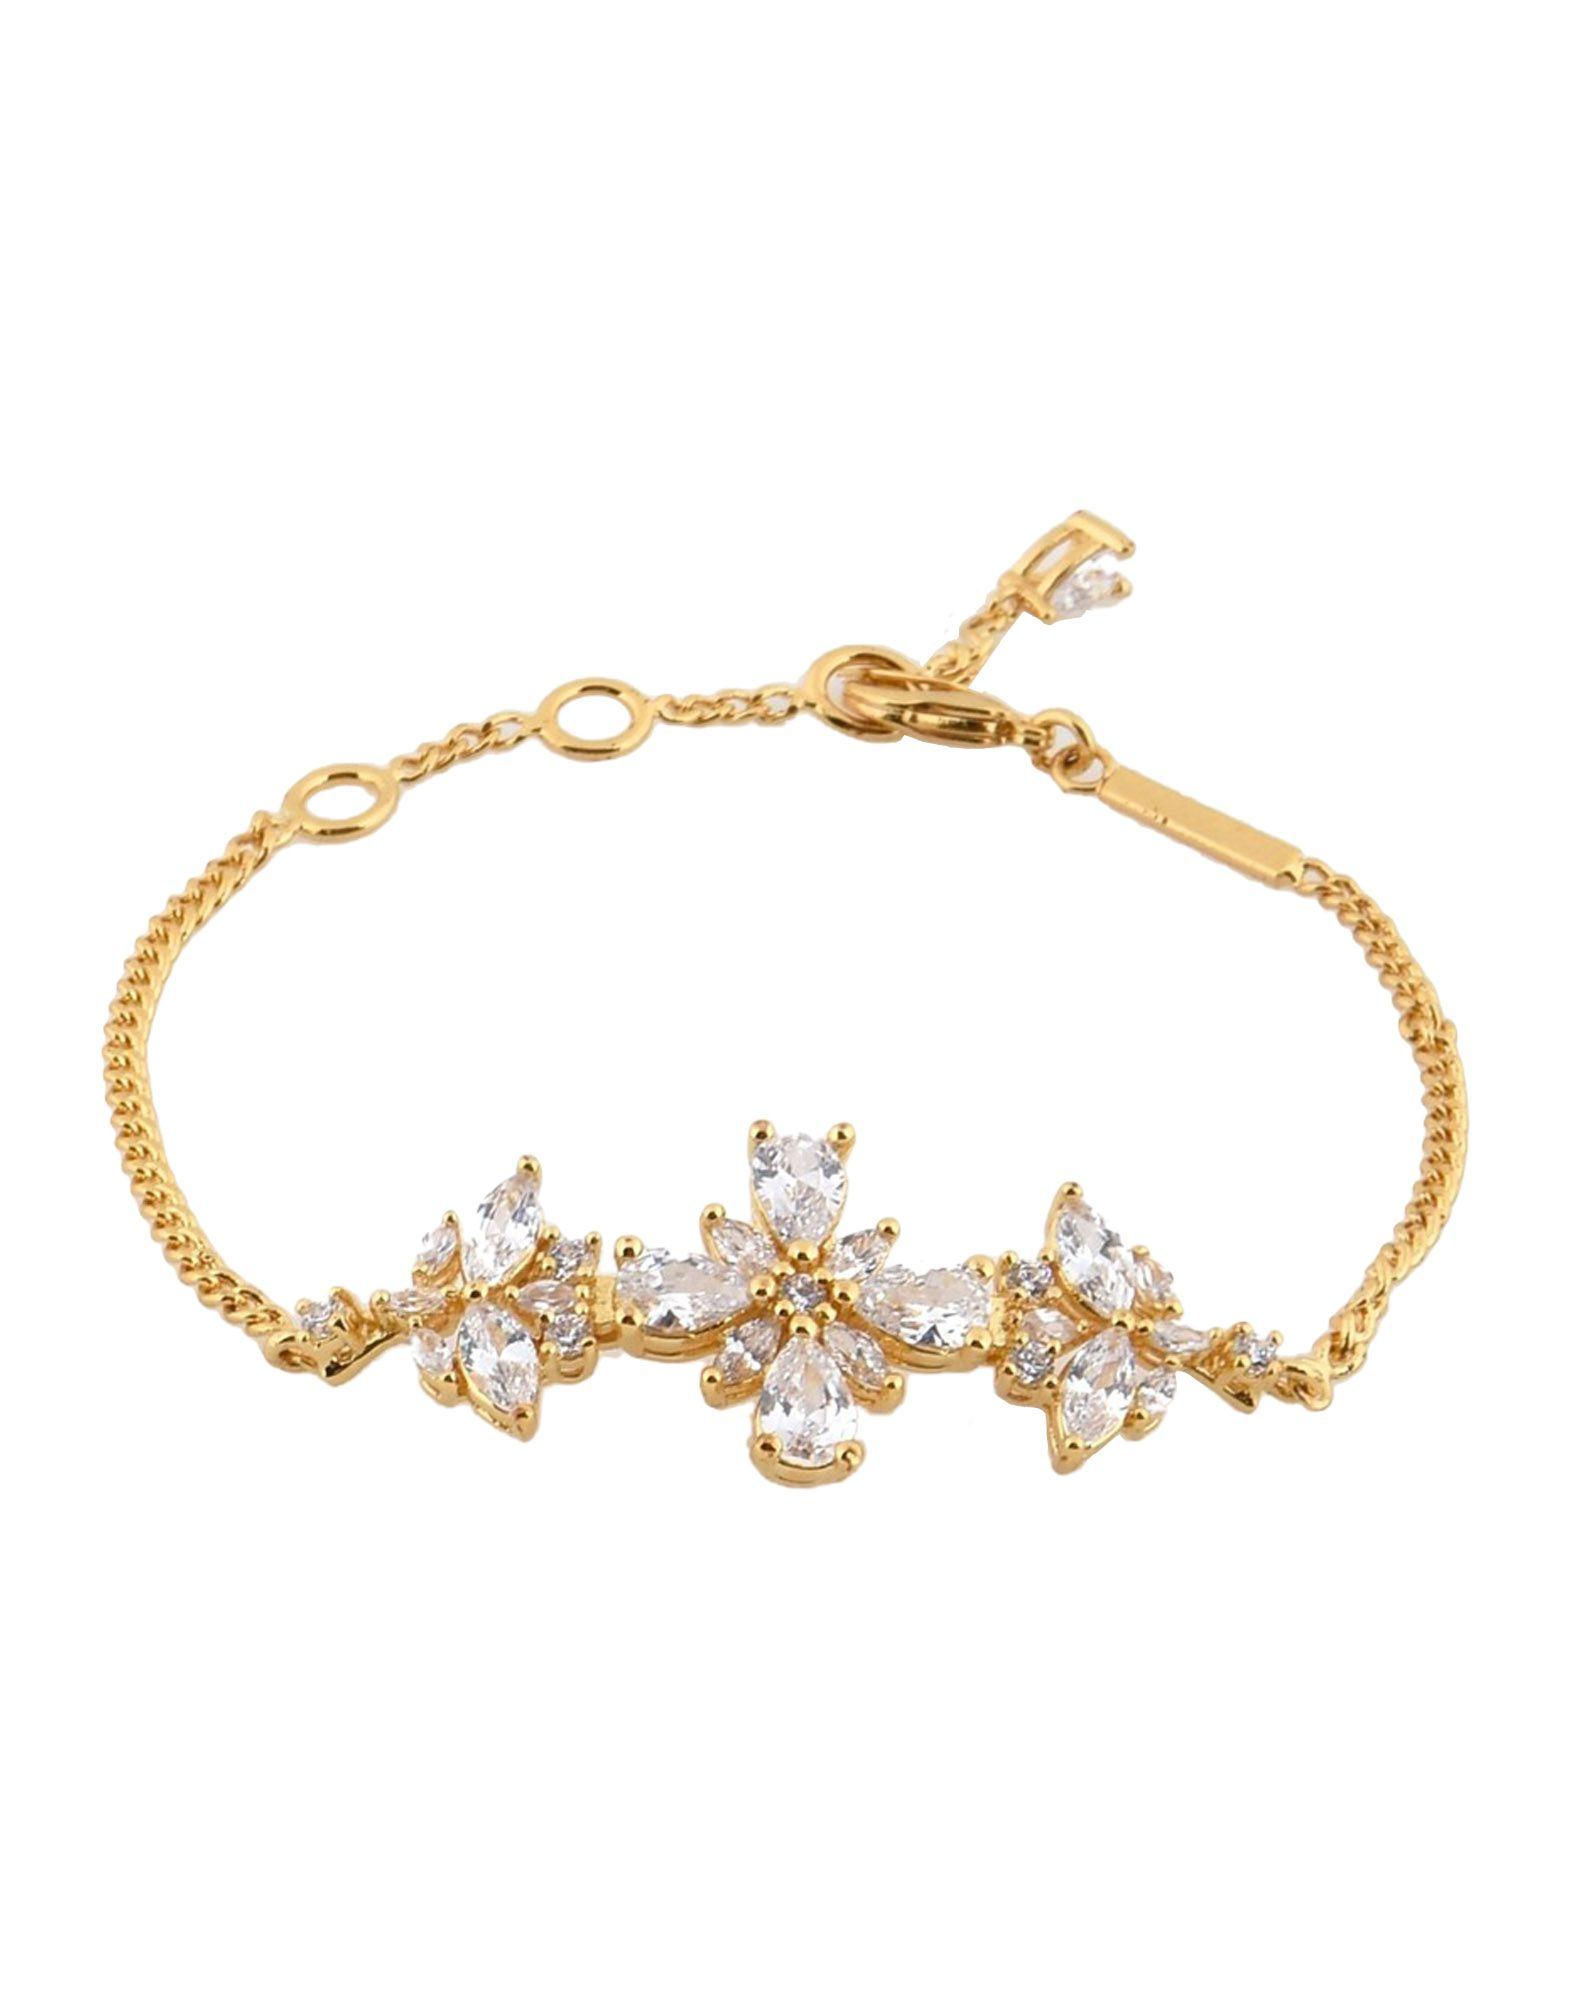 Bracciale Shourouk Flower Z Bracelet - Donna - Acquista online su